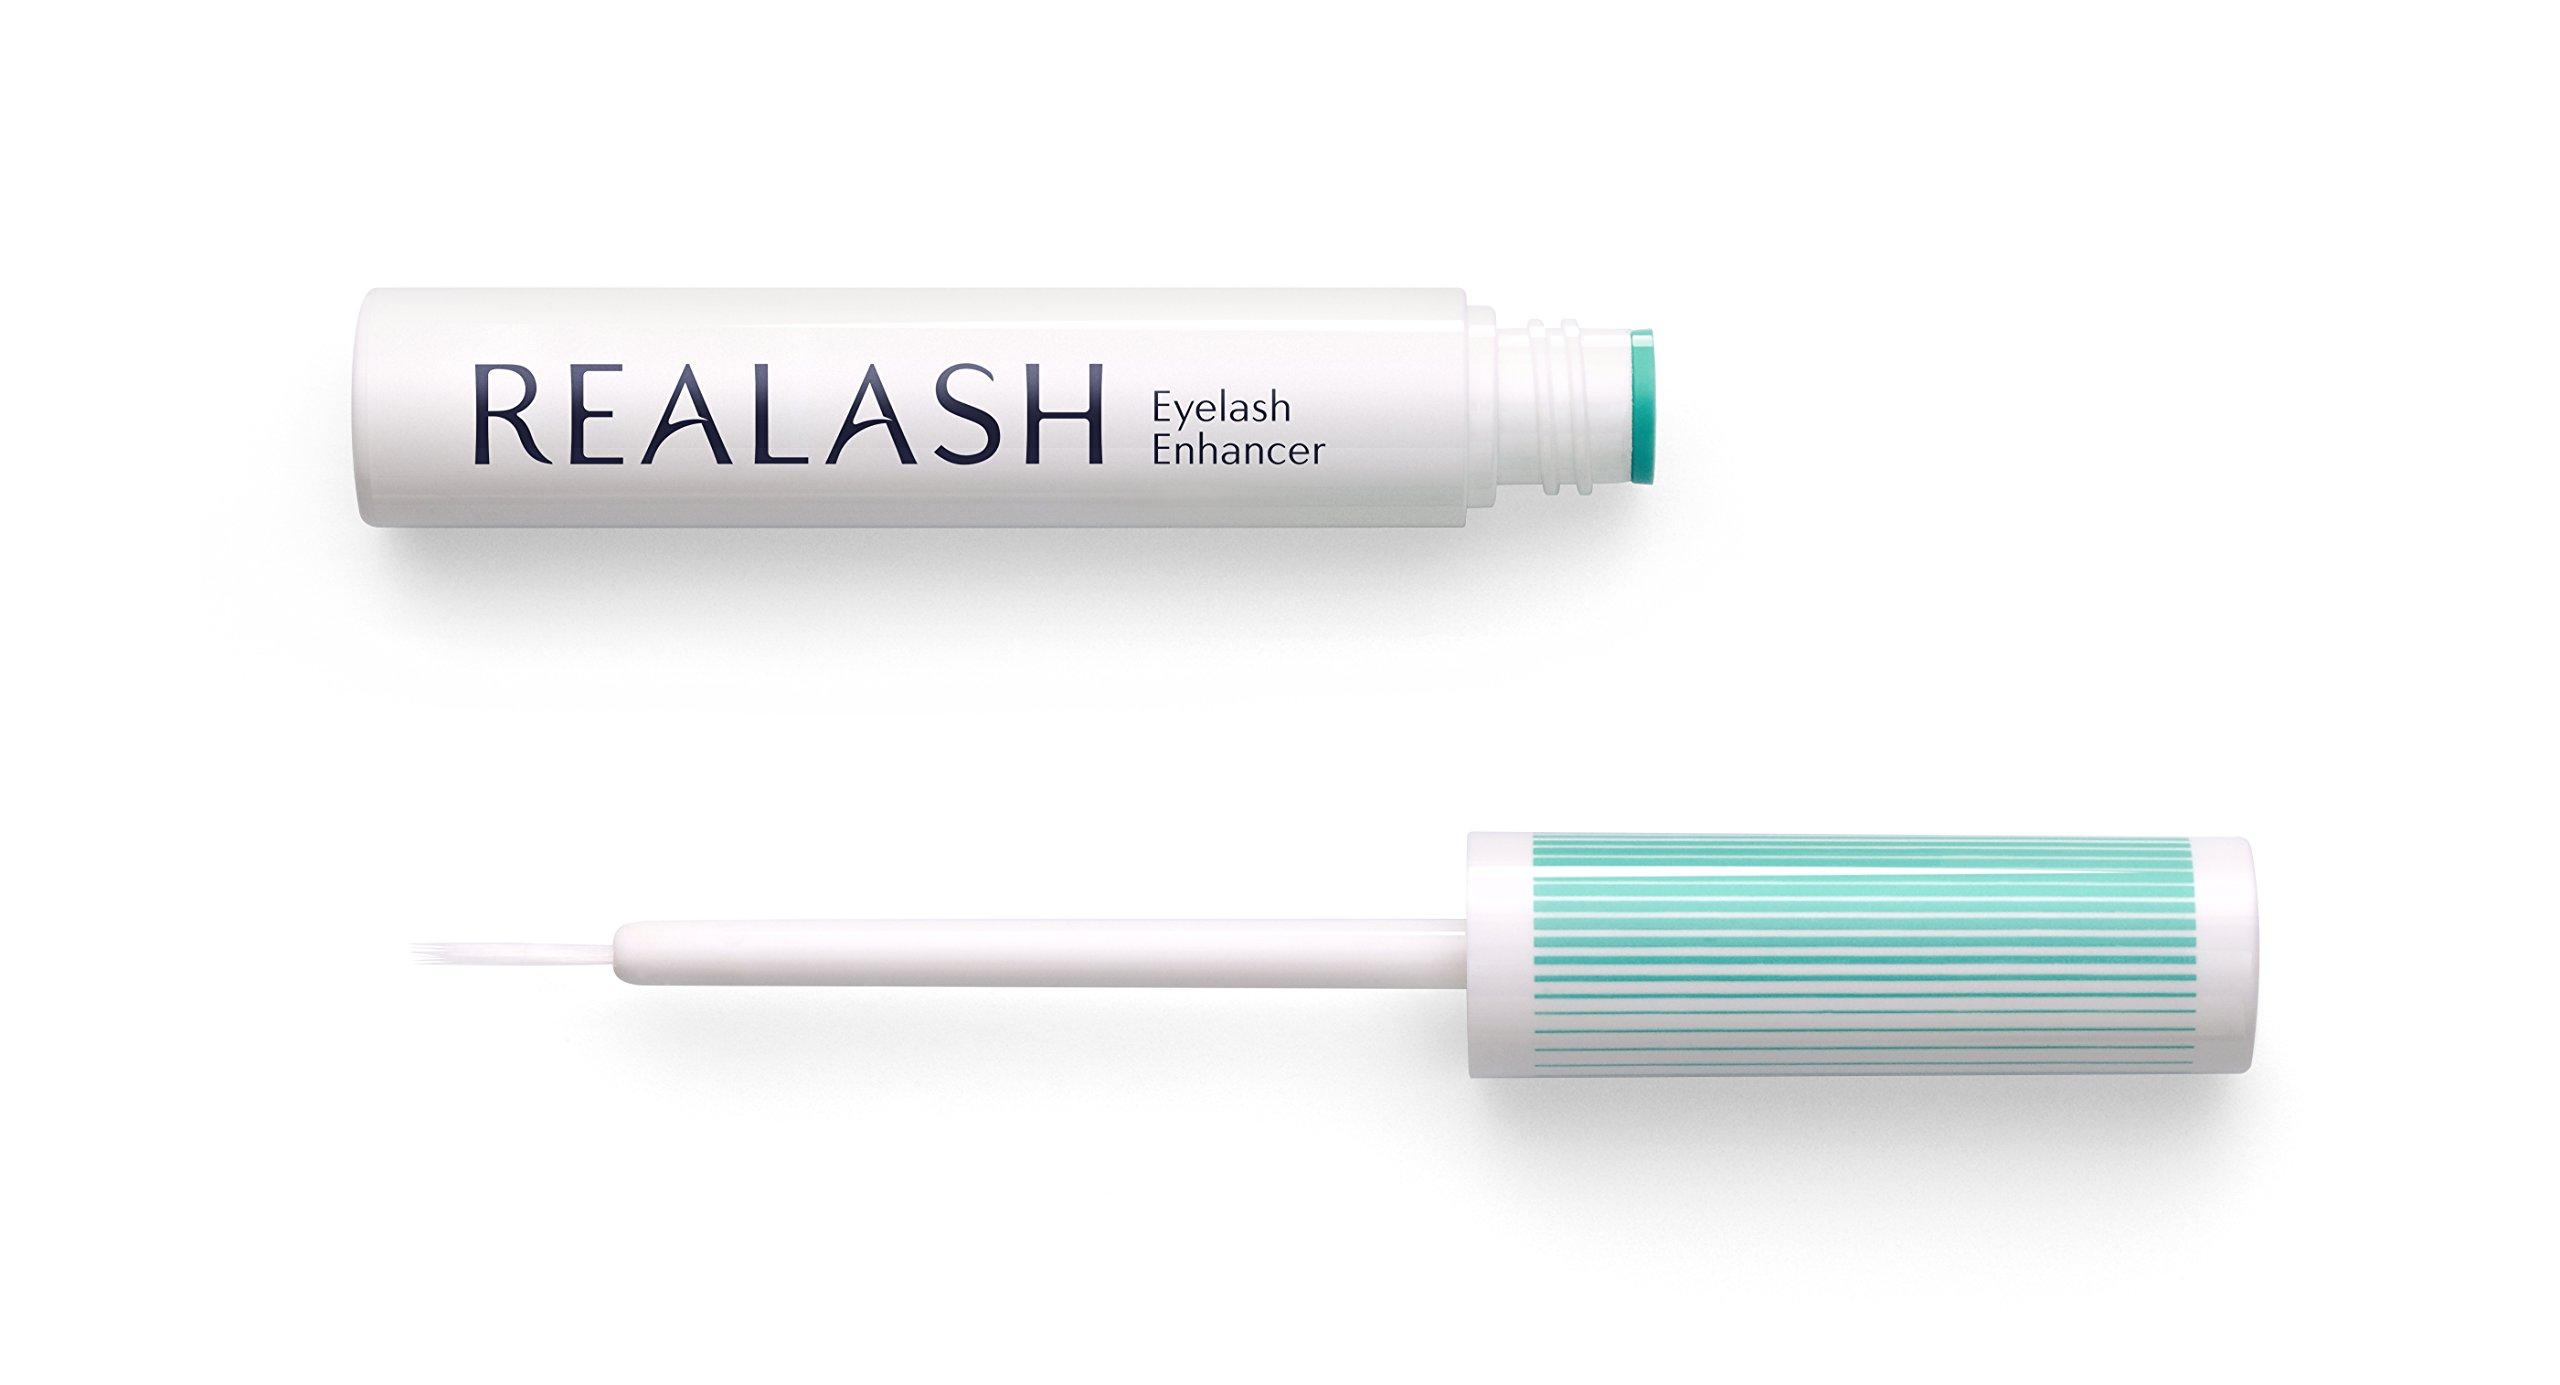 REALASH Eyelash Enhancer Enhancement Longer and Thicker Lashes Growth Serum 3ml by Orphica Essential